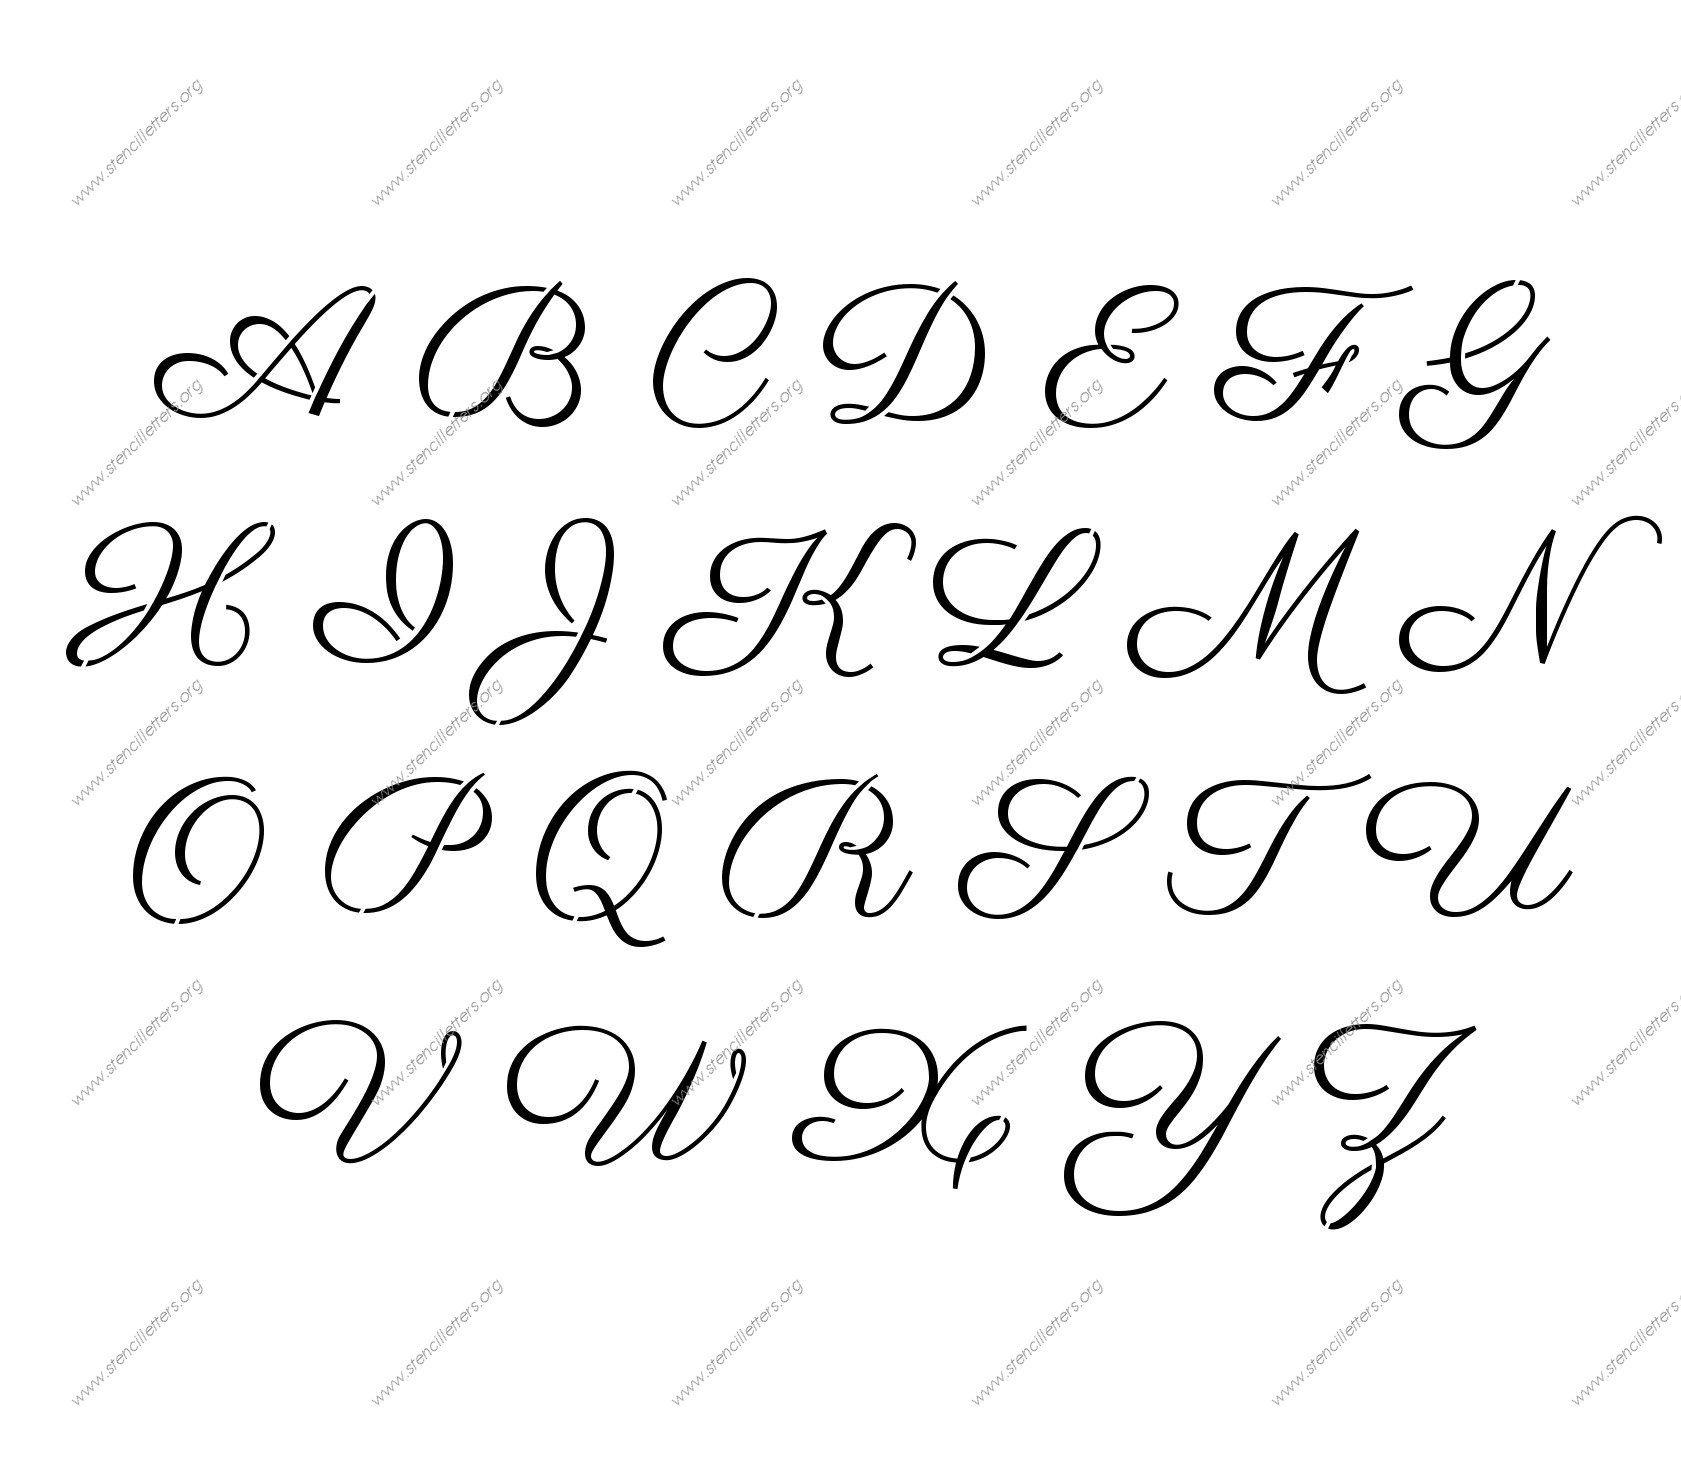 Free Printable Letter Stencils 2 - Crearphpnuke - Free Printable Calligraphy Letter Stencils